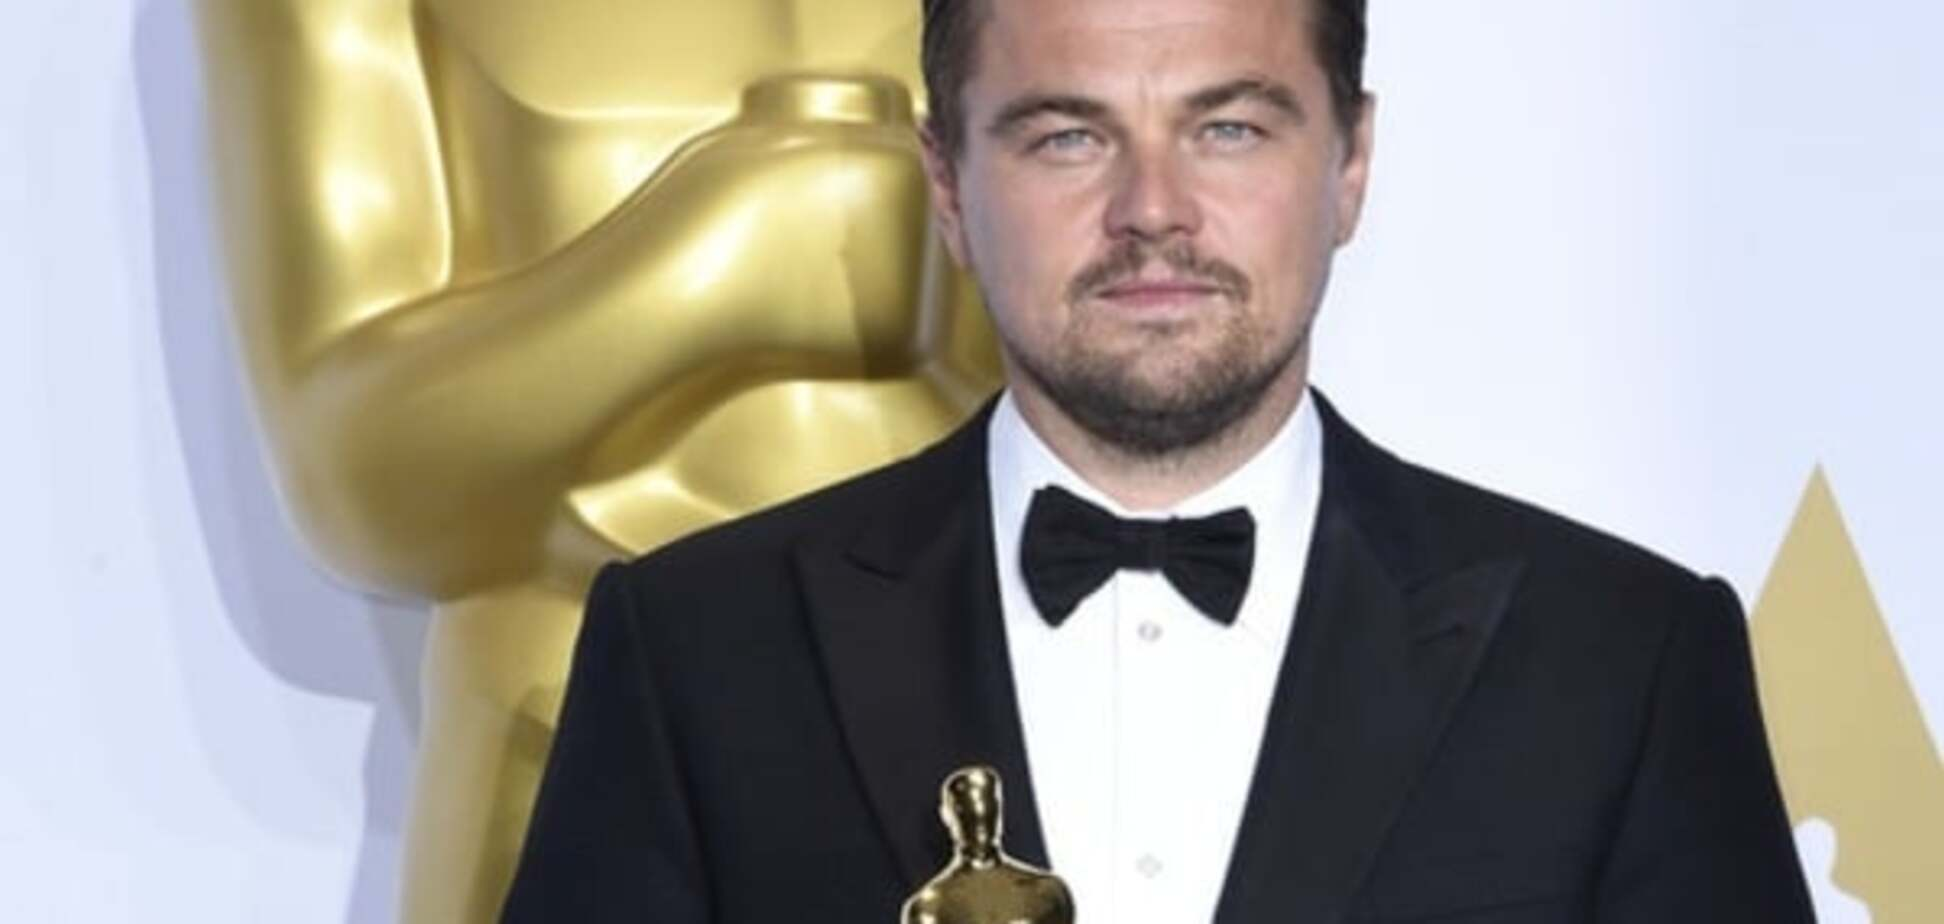 'Яндекс' с медведем поздравил ДиКаприо с получением 'Оскара'